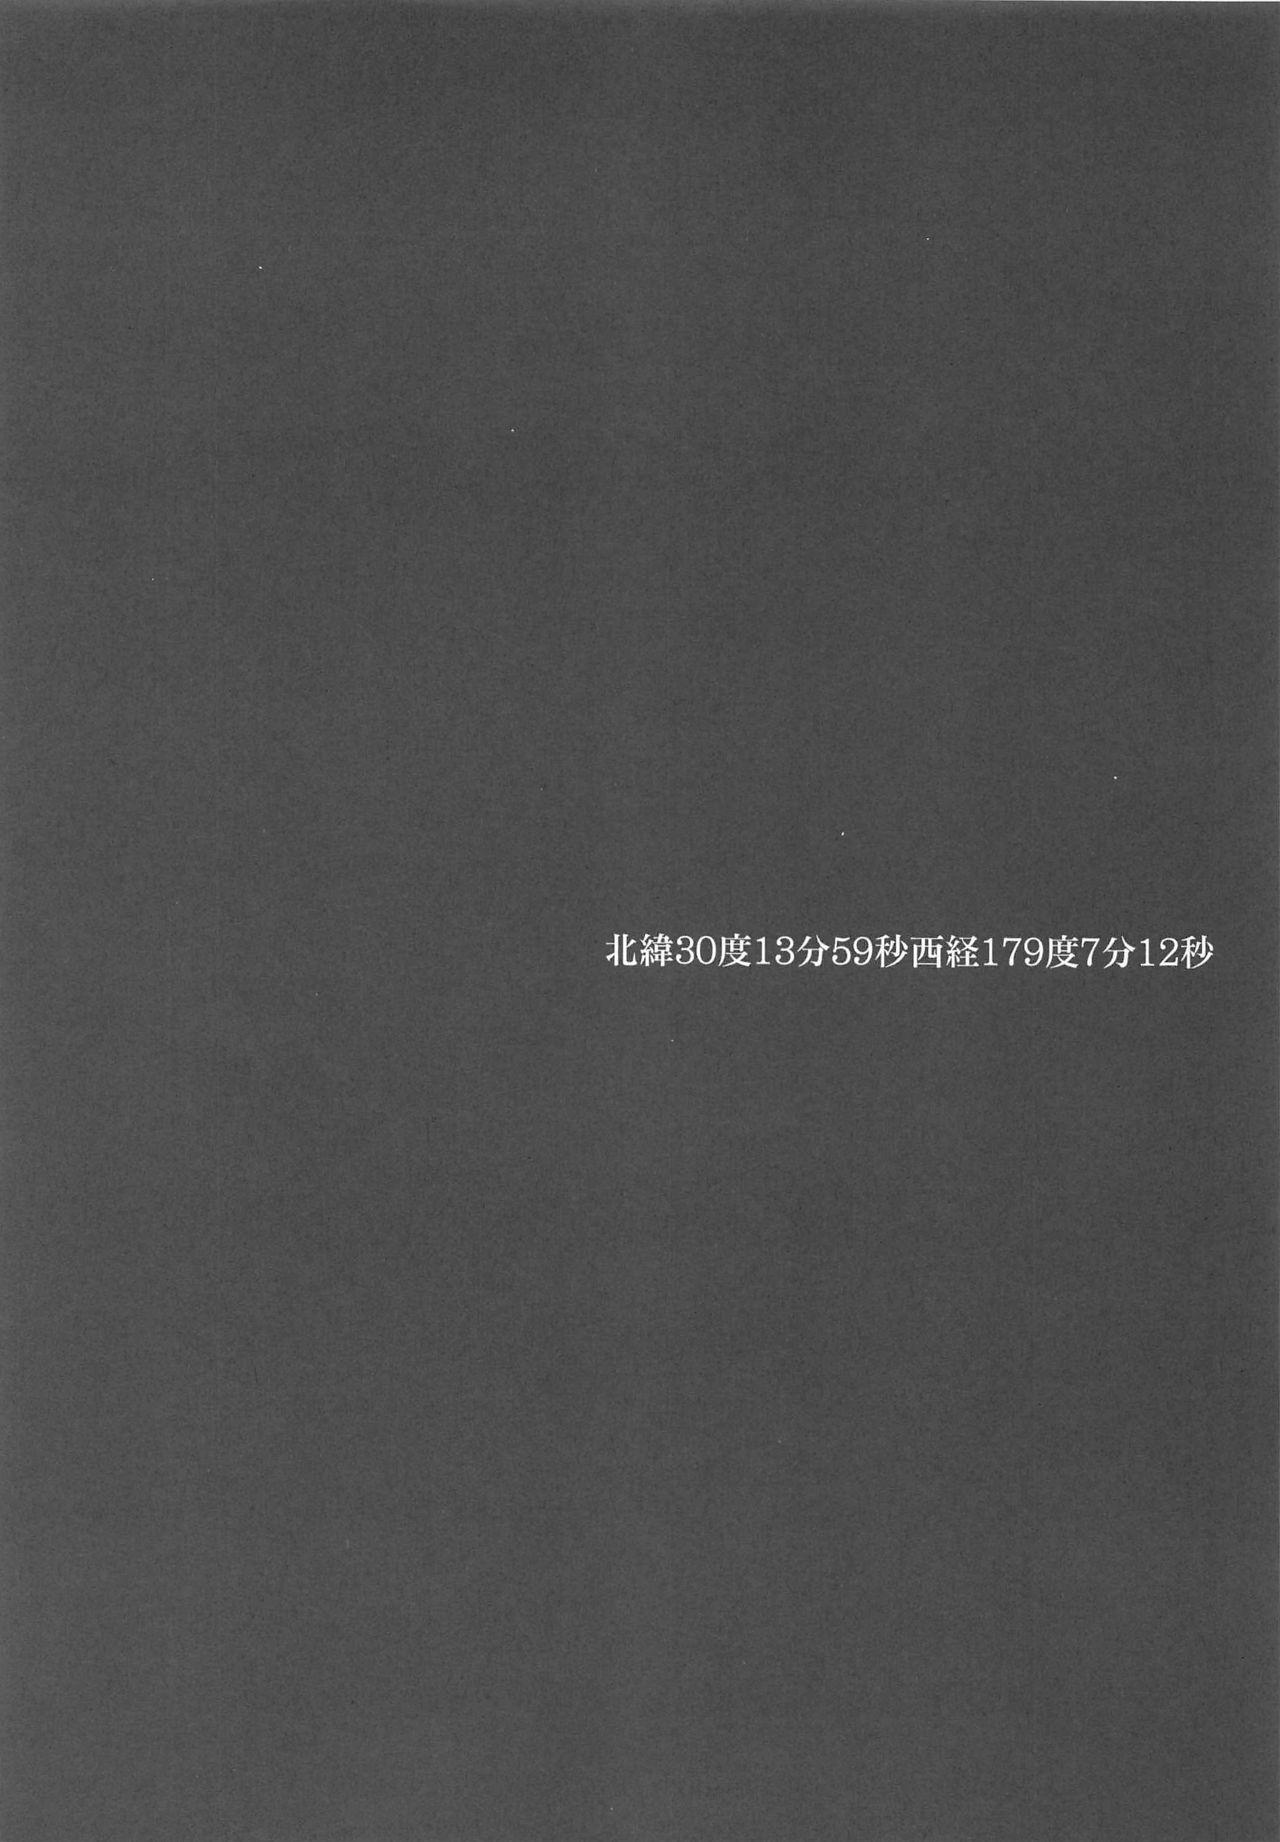 (C85) [Nise-Jyuusyofutei (Nakamura Takeshi)] Hokui 30-do 13-pun 59-byou Seikei 179-do 7-fun 12-byou (Kantai Collection -KanColle-) 20